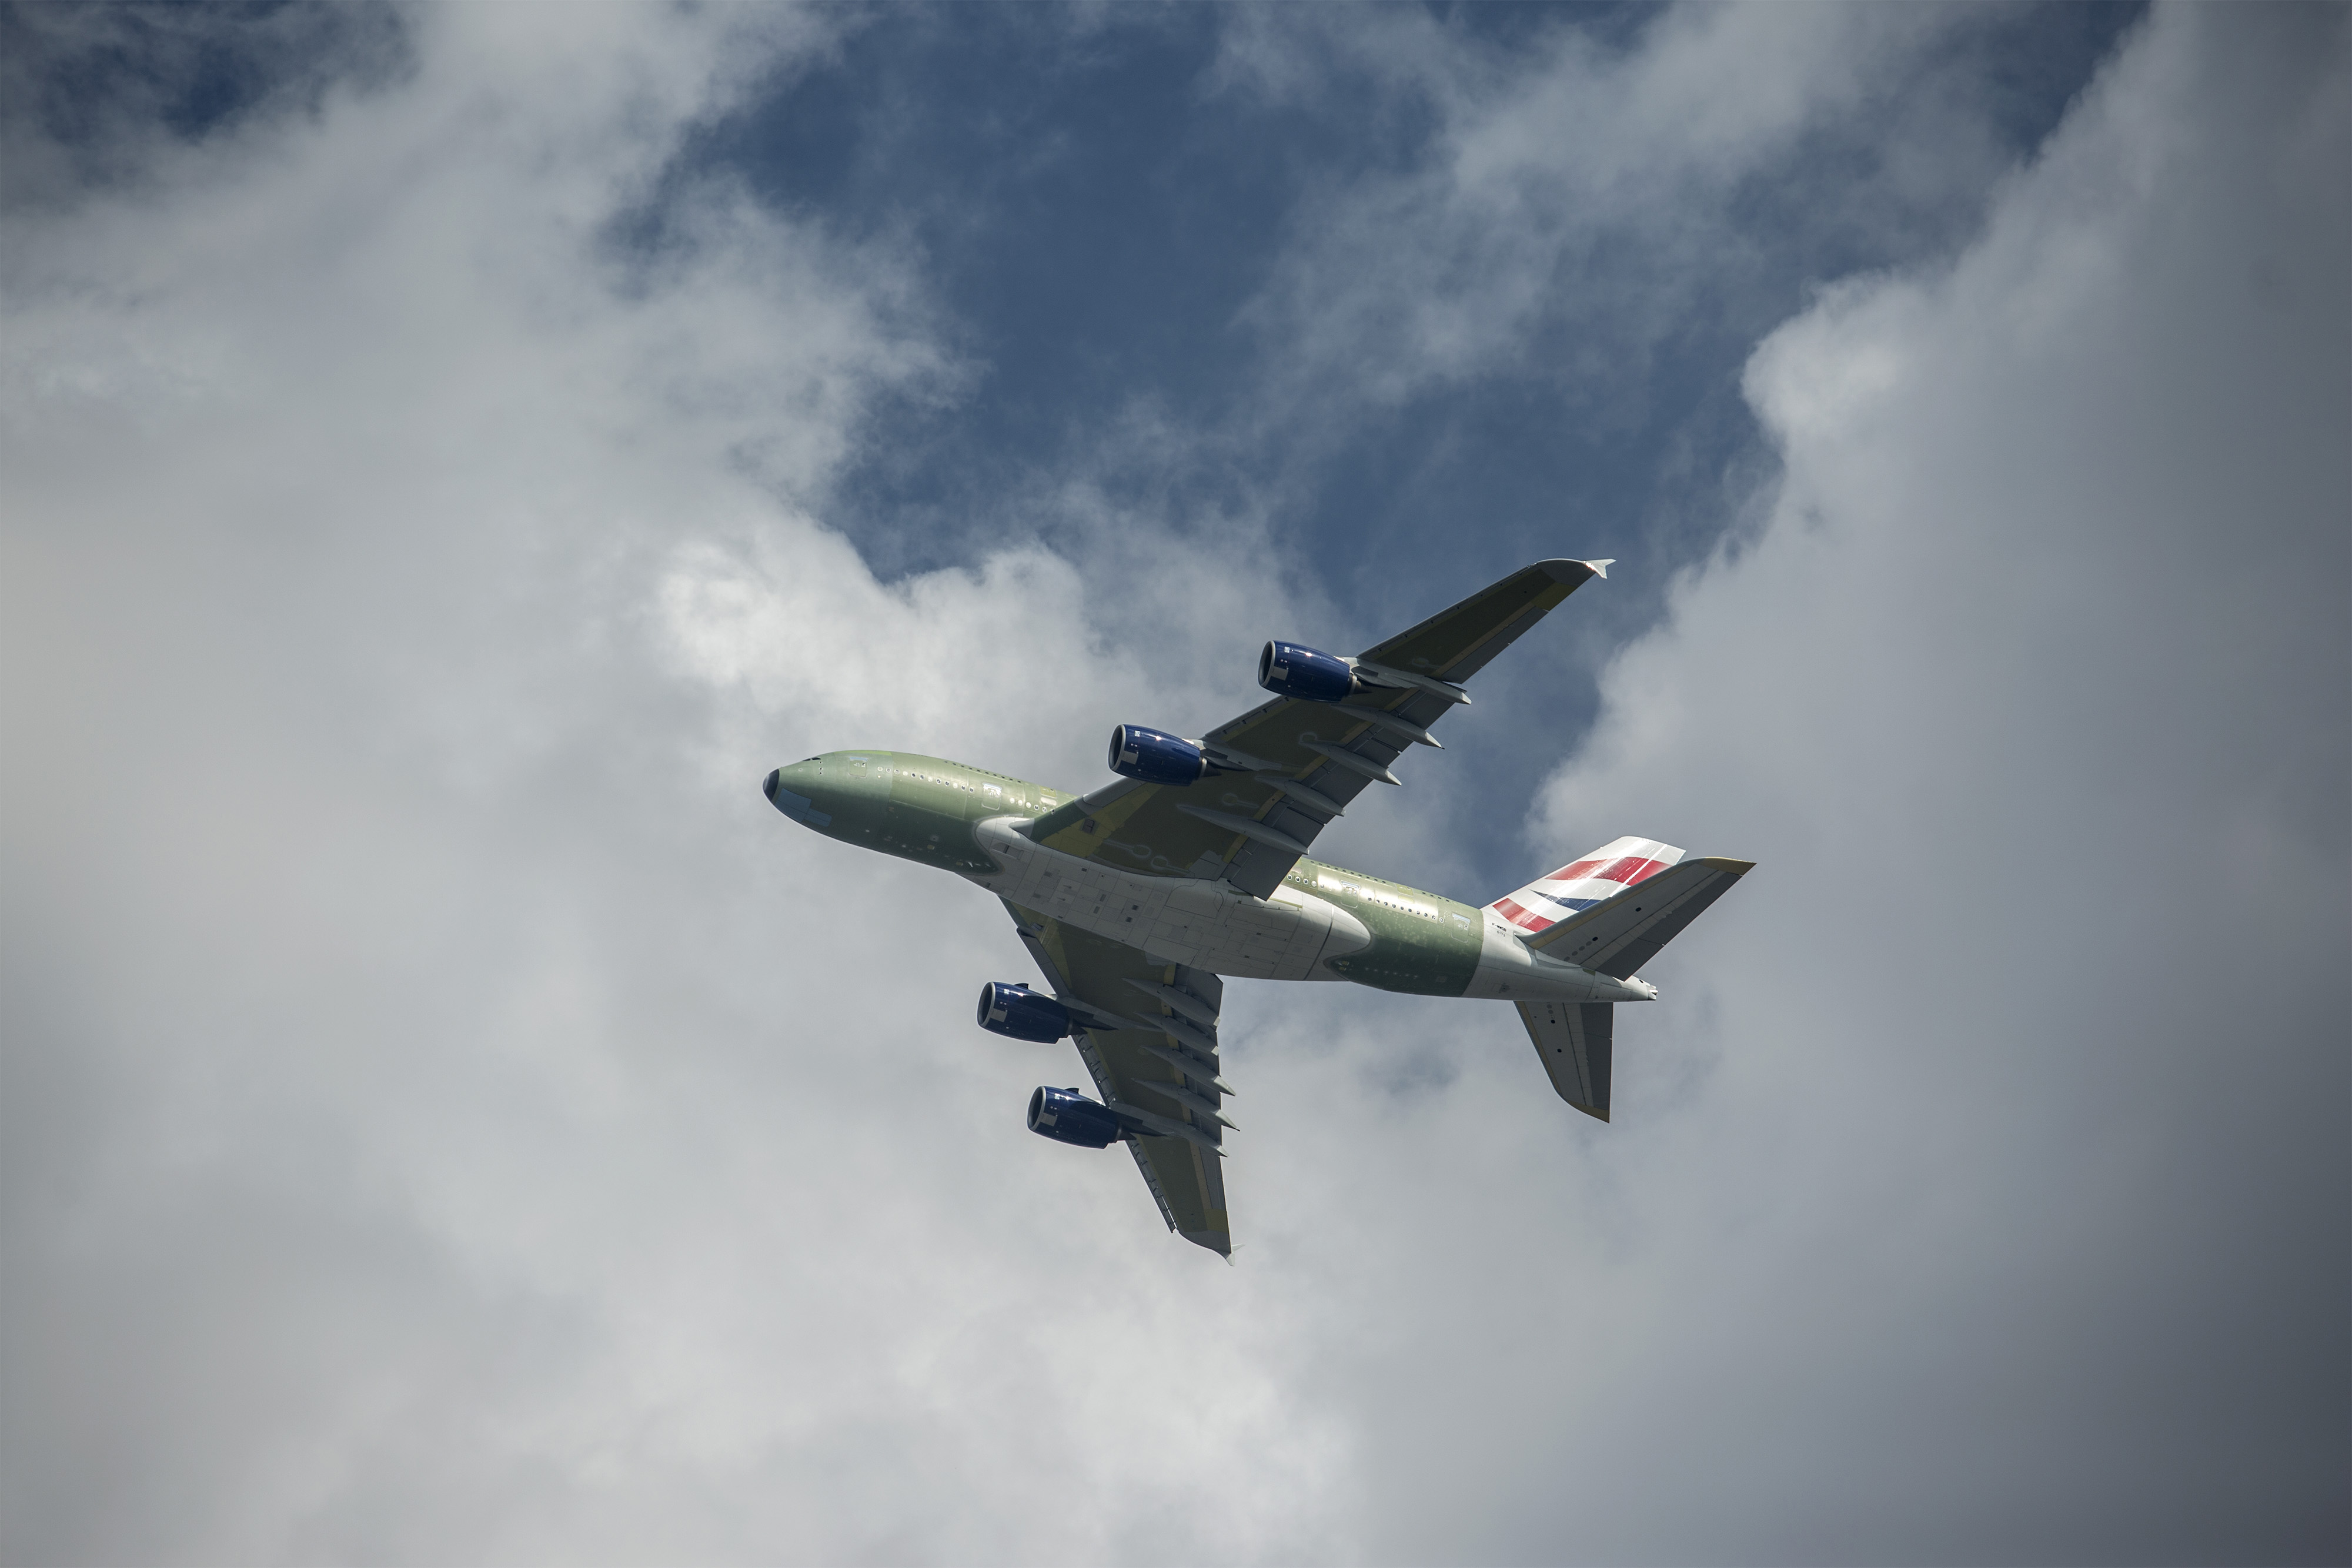 Airbus Group NV's Airbus A320 Neo Aircraft Makes Debut Flight